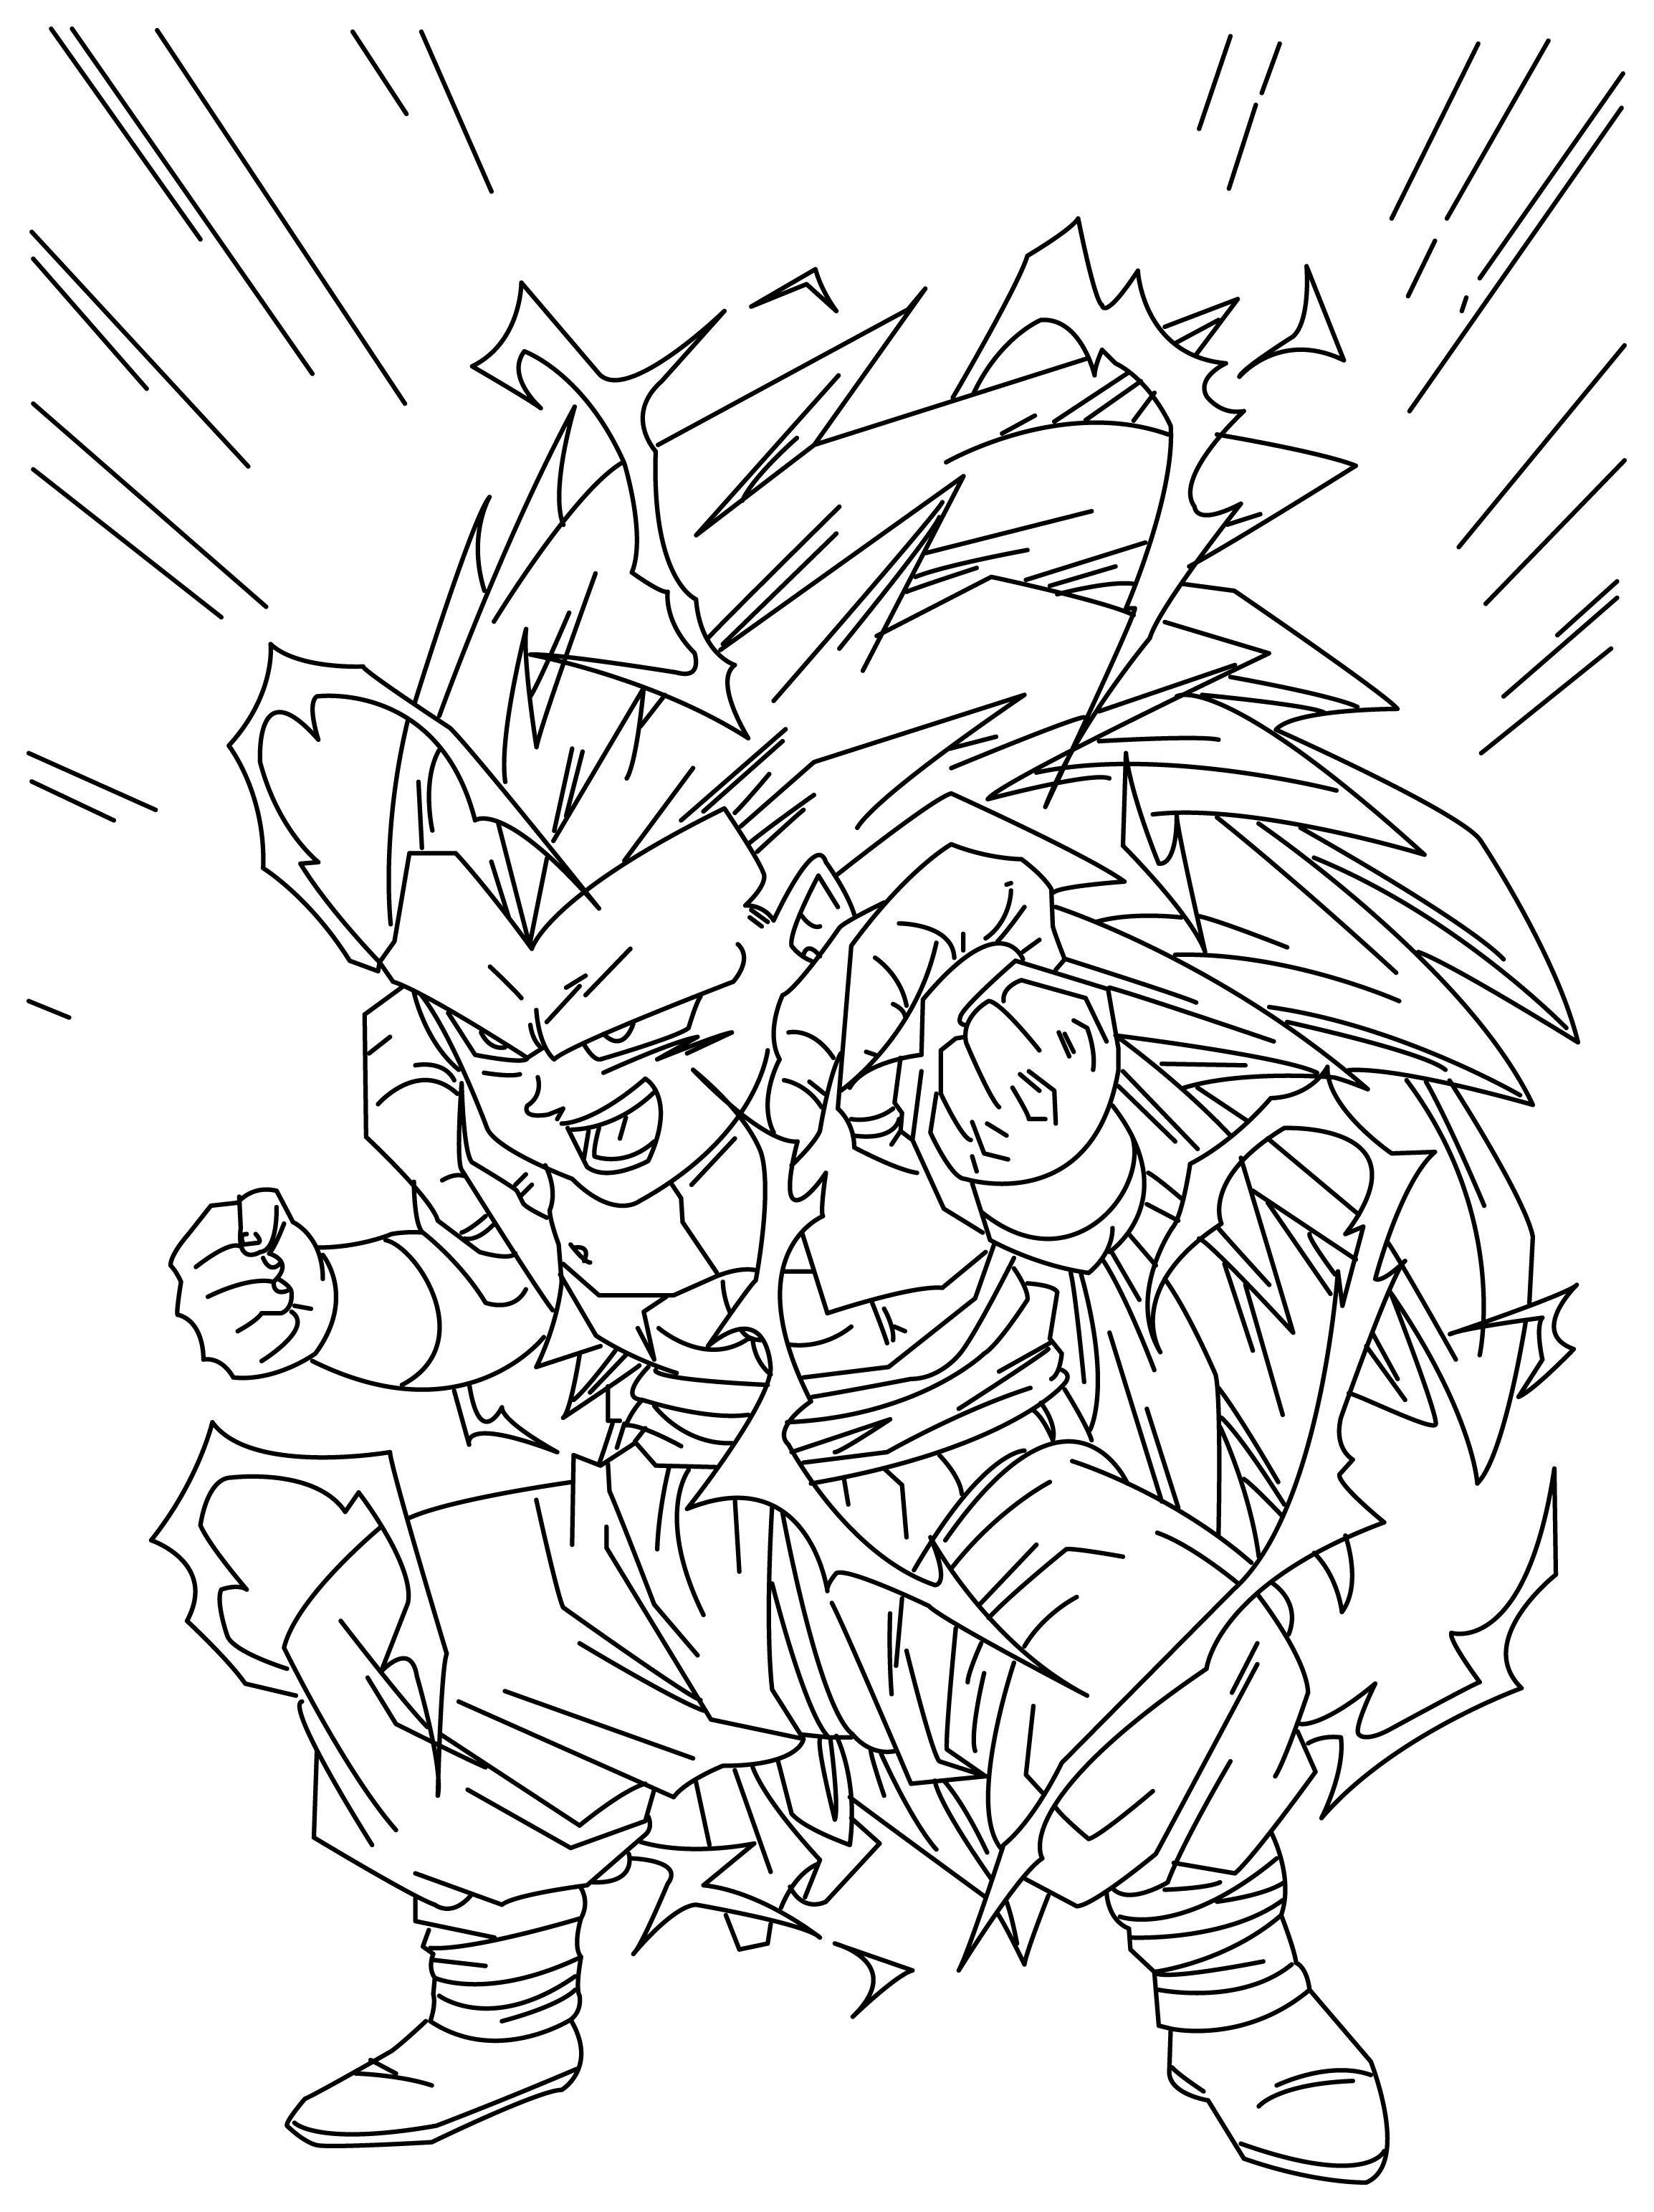 gotenks coloring pages - ssj3 gotenks by veana on deviantart